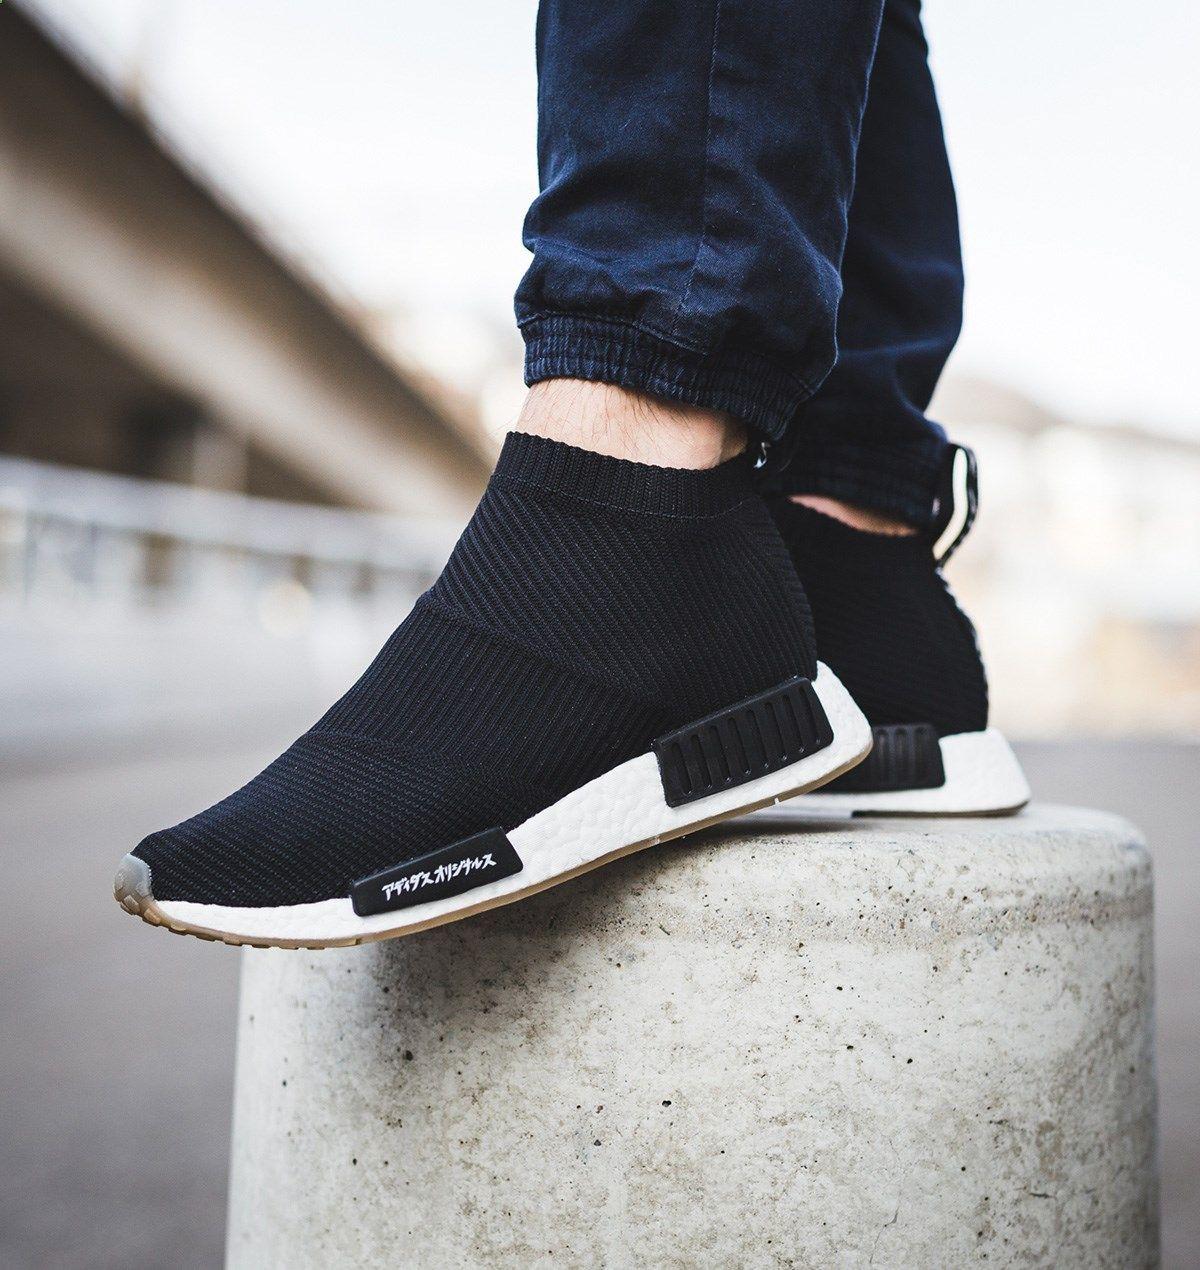 c23ab1e57230 On-Foot  MIKITYPE x United Arrows Sons x adidas NMD CS1 Primeknit - EU  Kicks  Sneaker Magazine